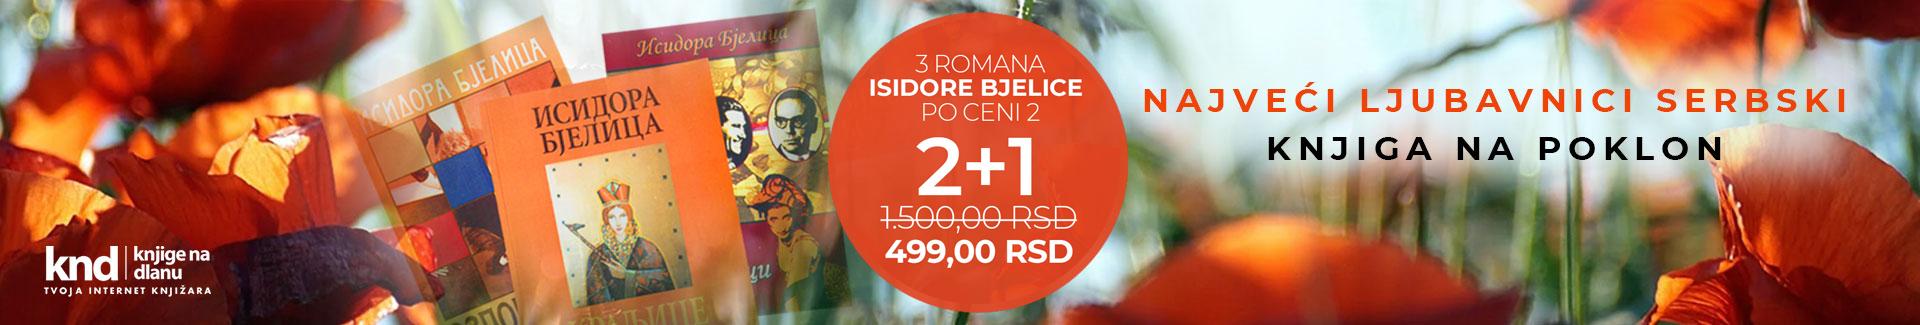 AKCIJA ISIDORA BJELICA 2 ROMANA PLUS 1 NA POKLON